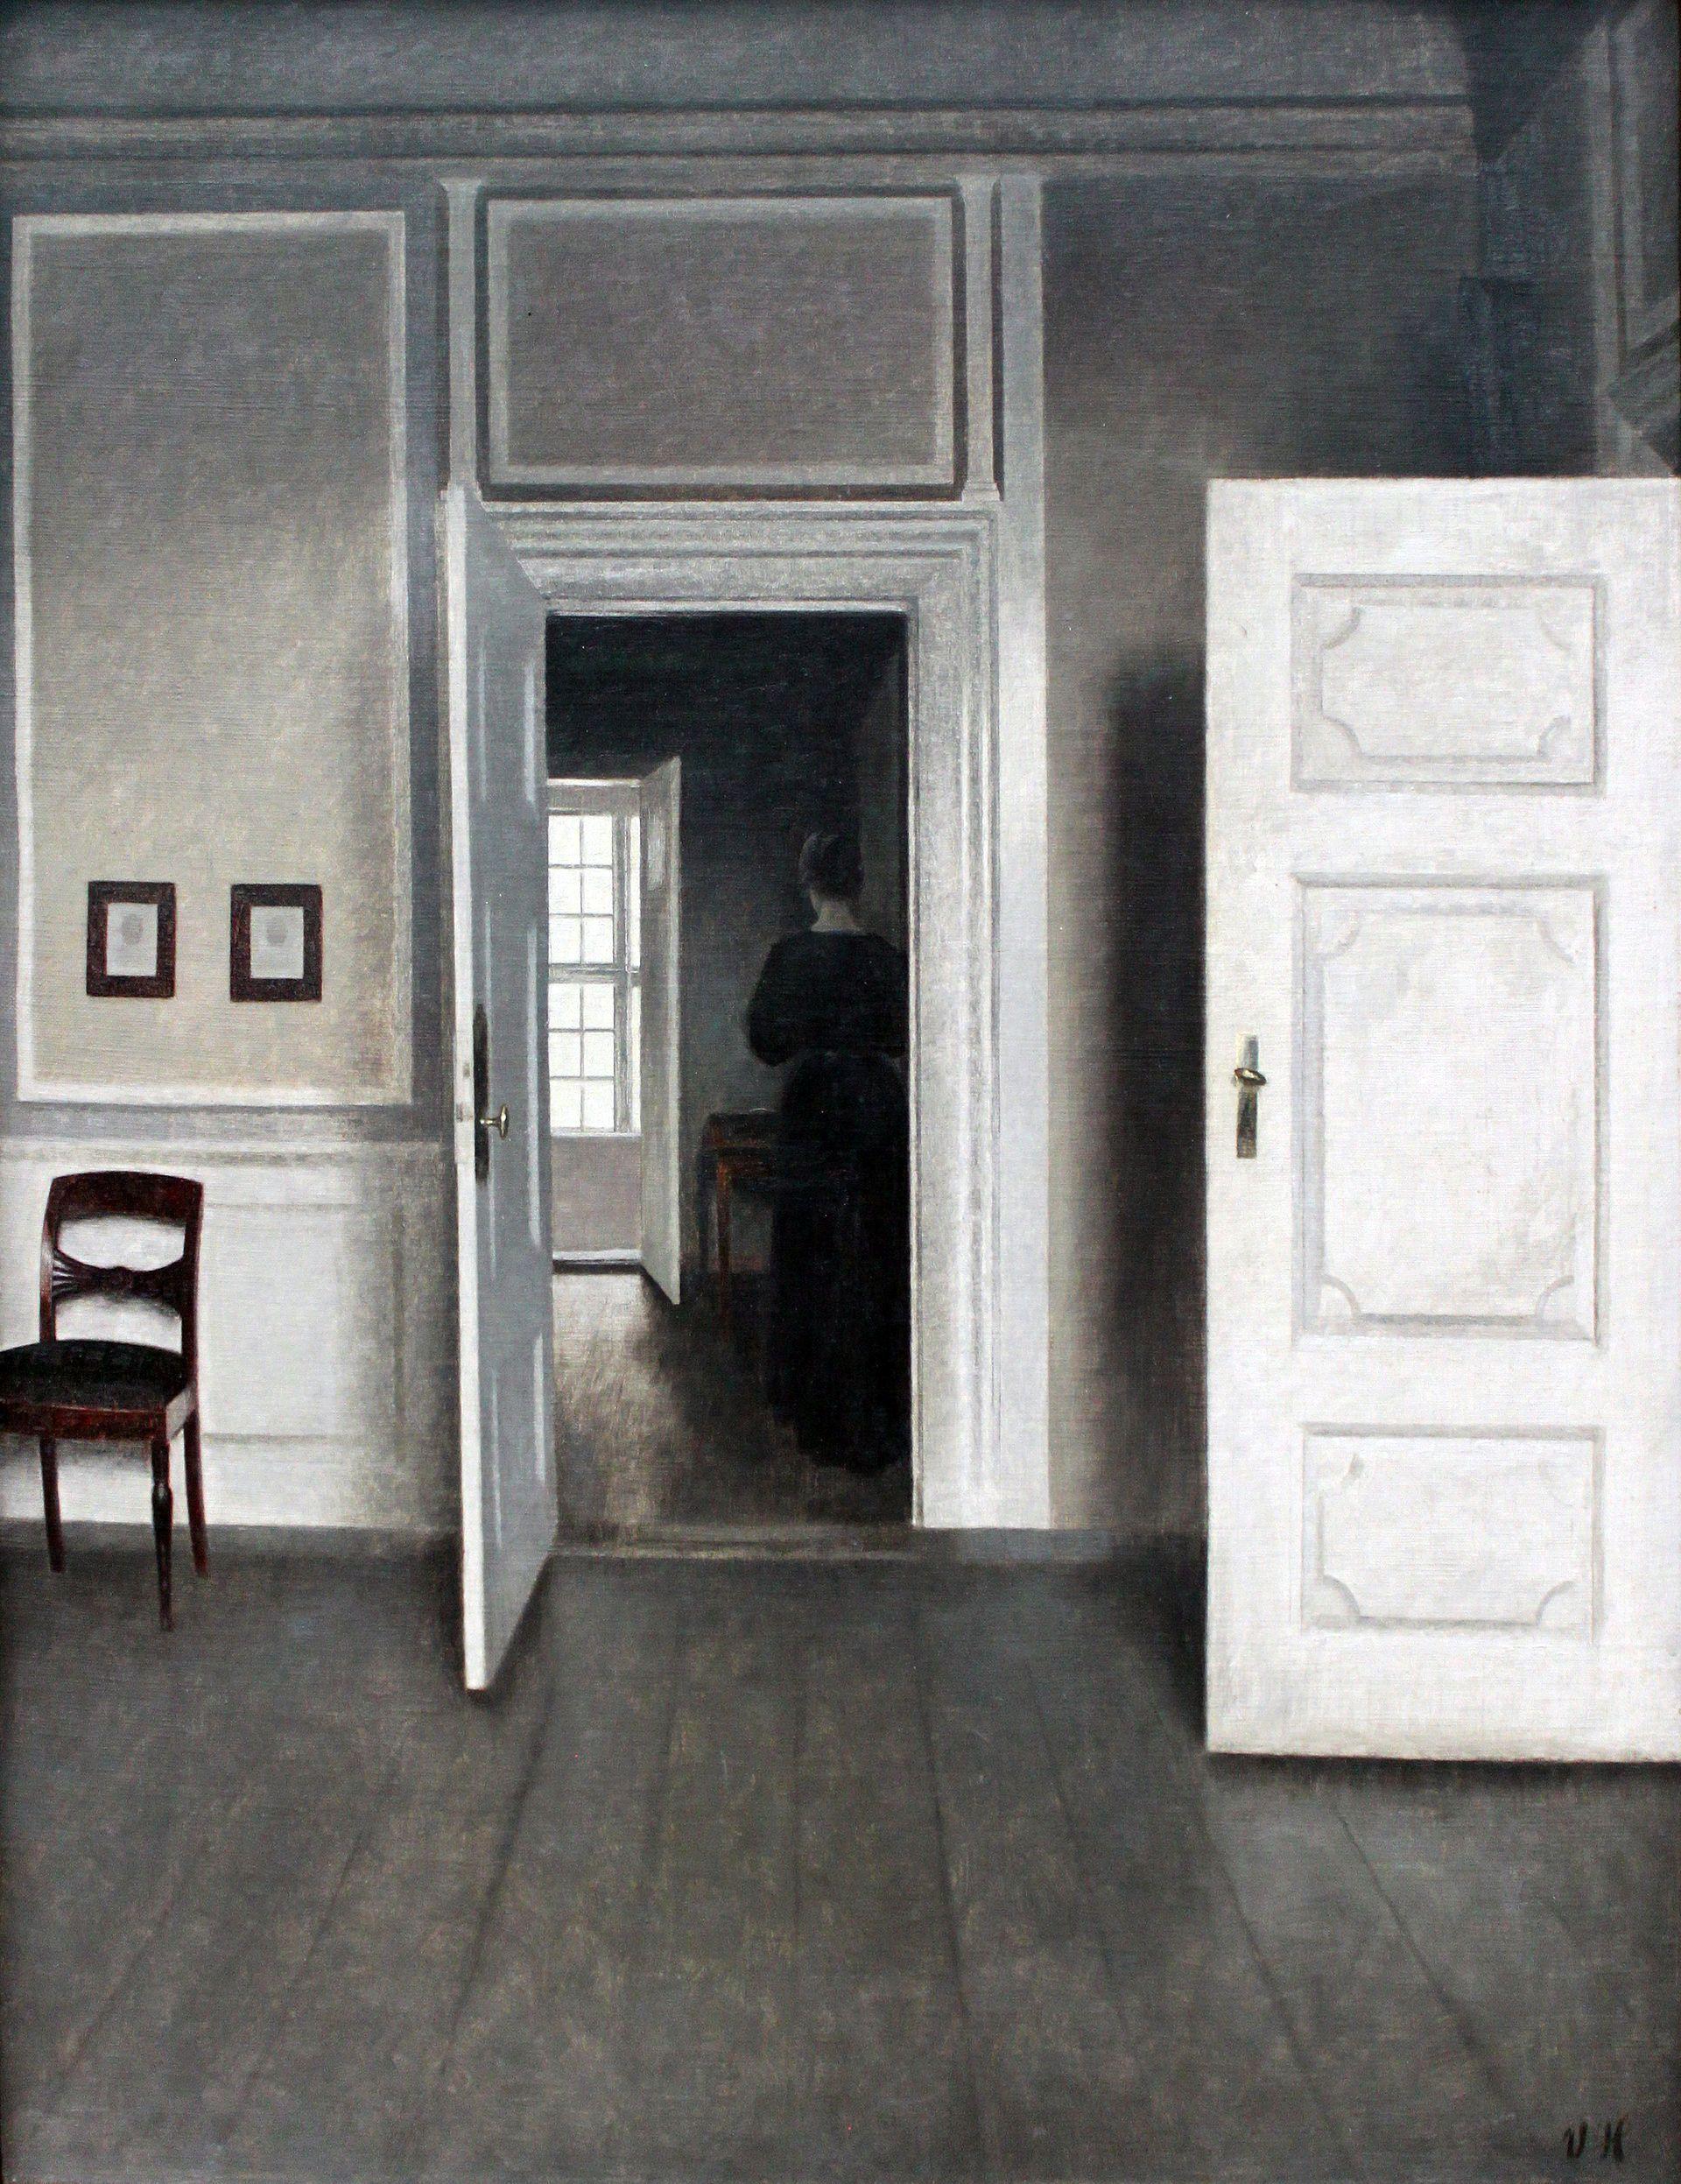 Interieur kunst  1901 Hammershøi Interieur Strandgade 30 anagoria.JPG - Vilhelm ...